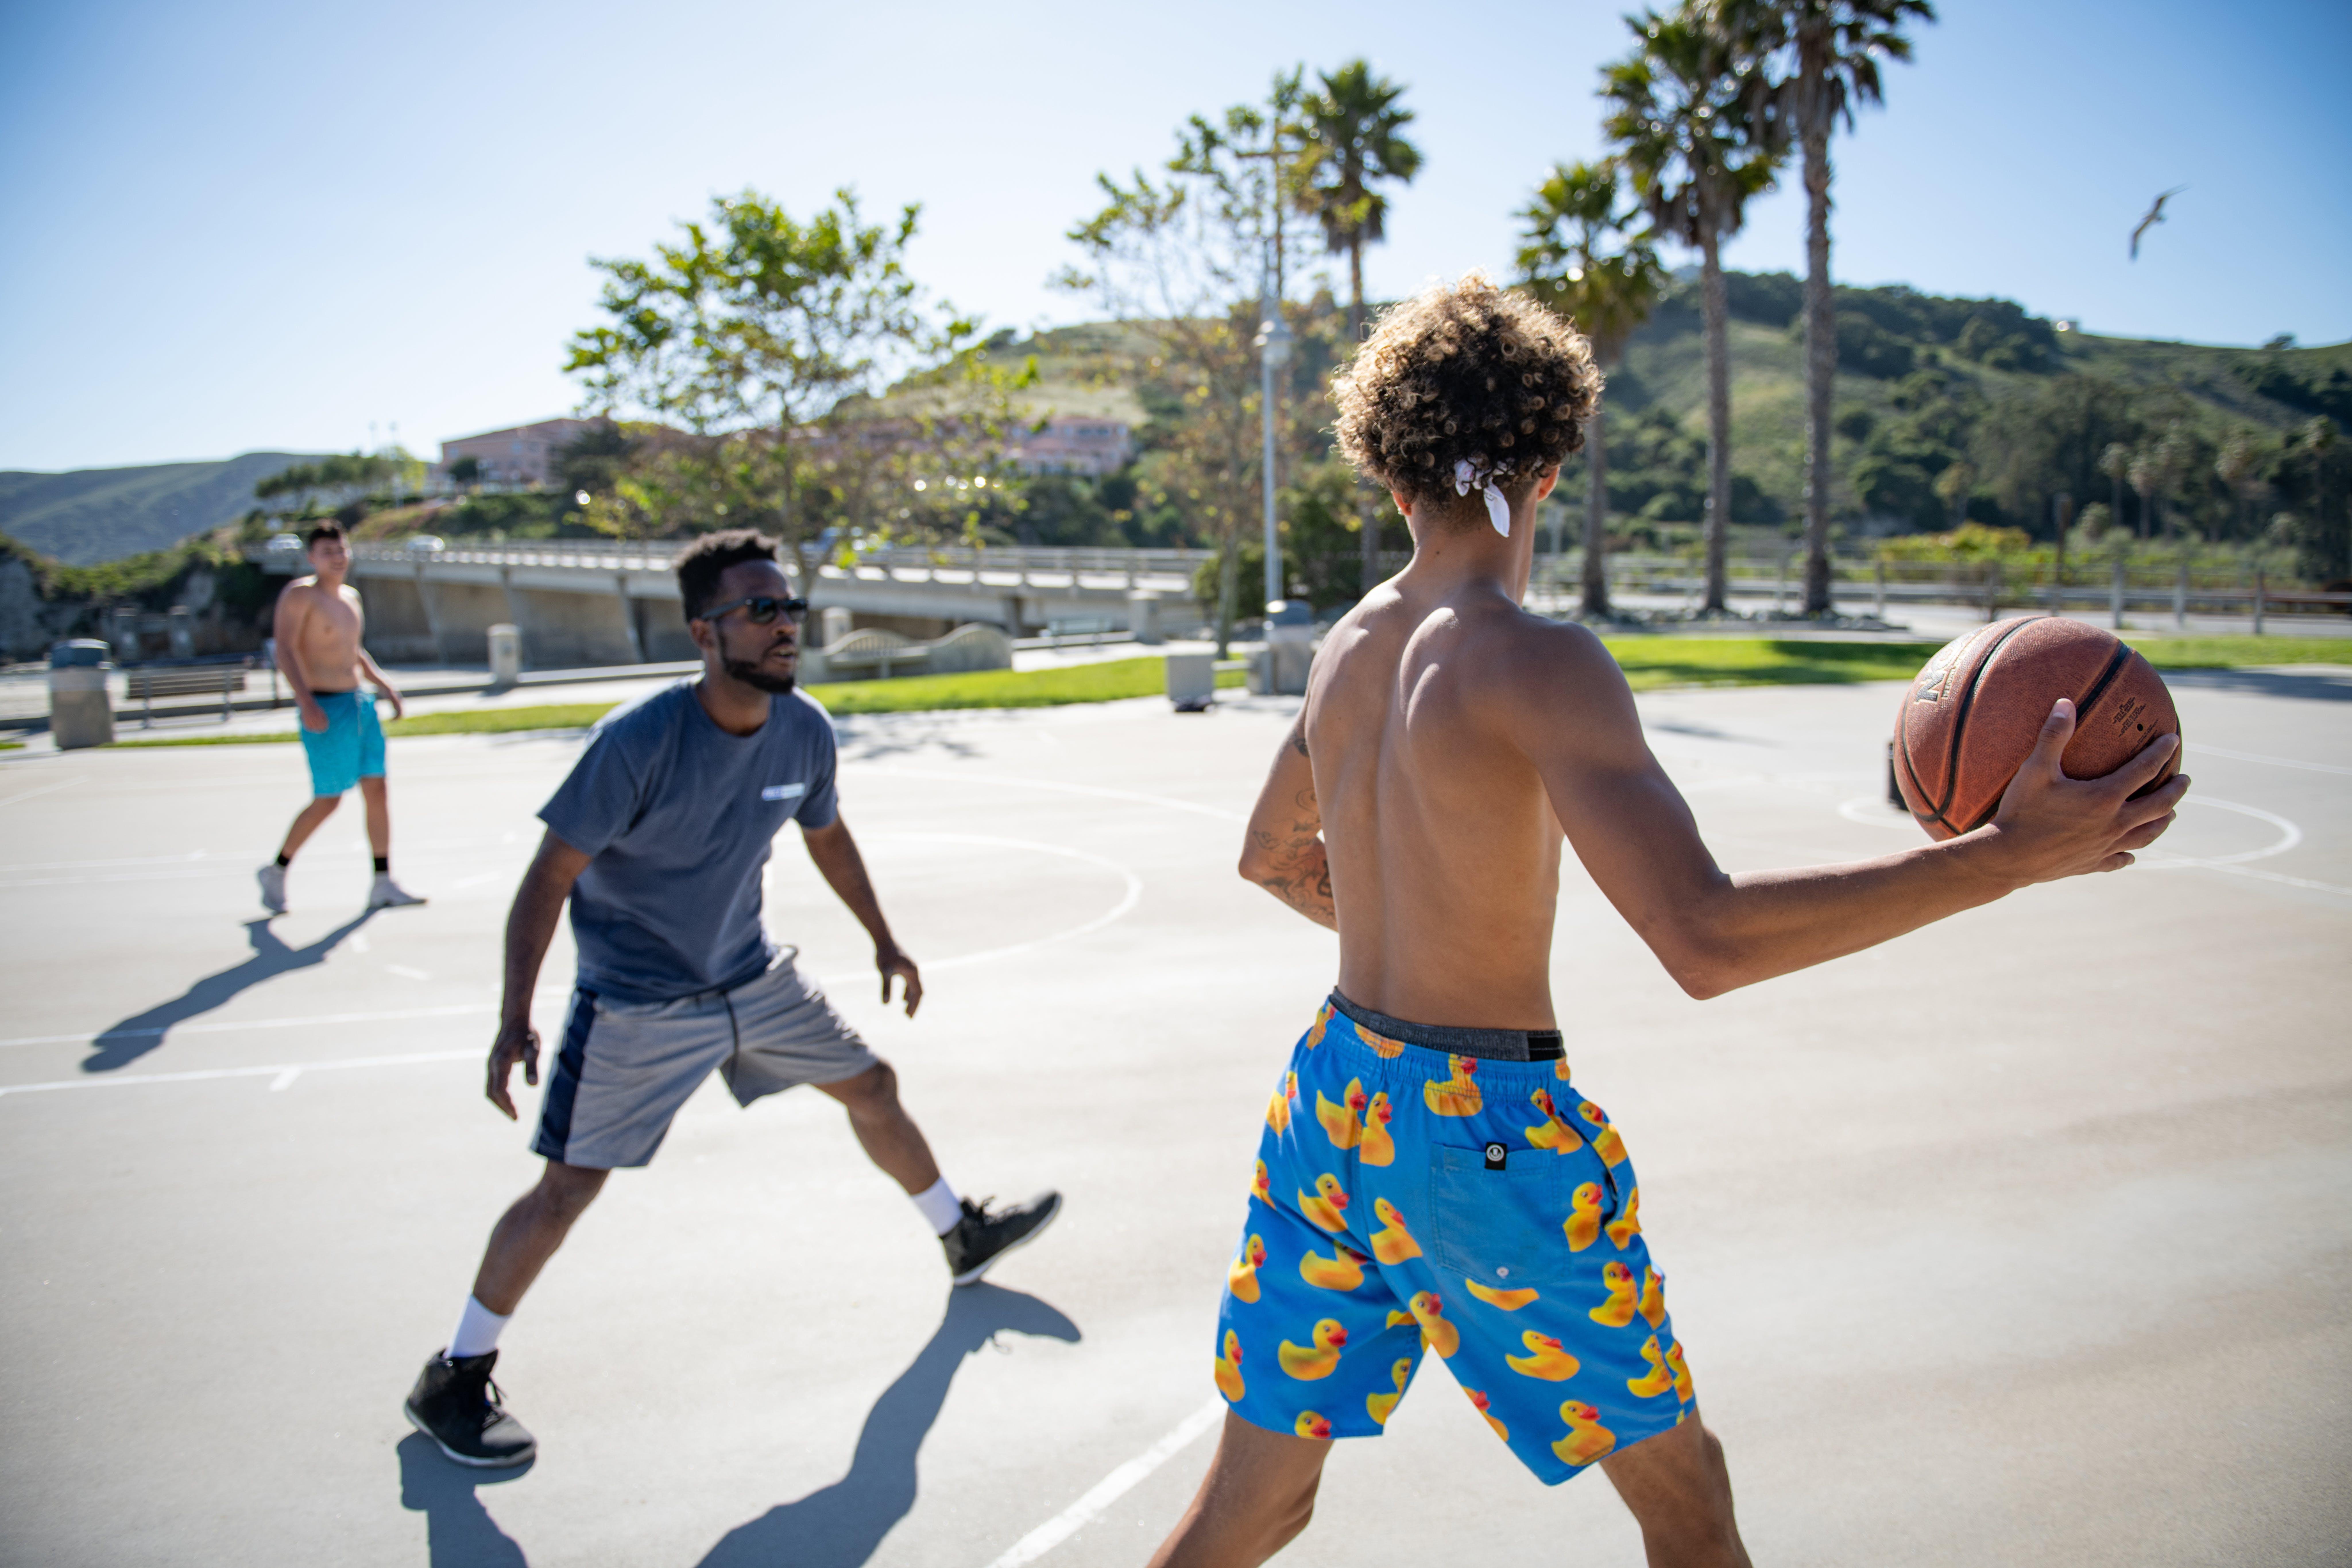 Three Man Playing Basketball